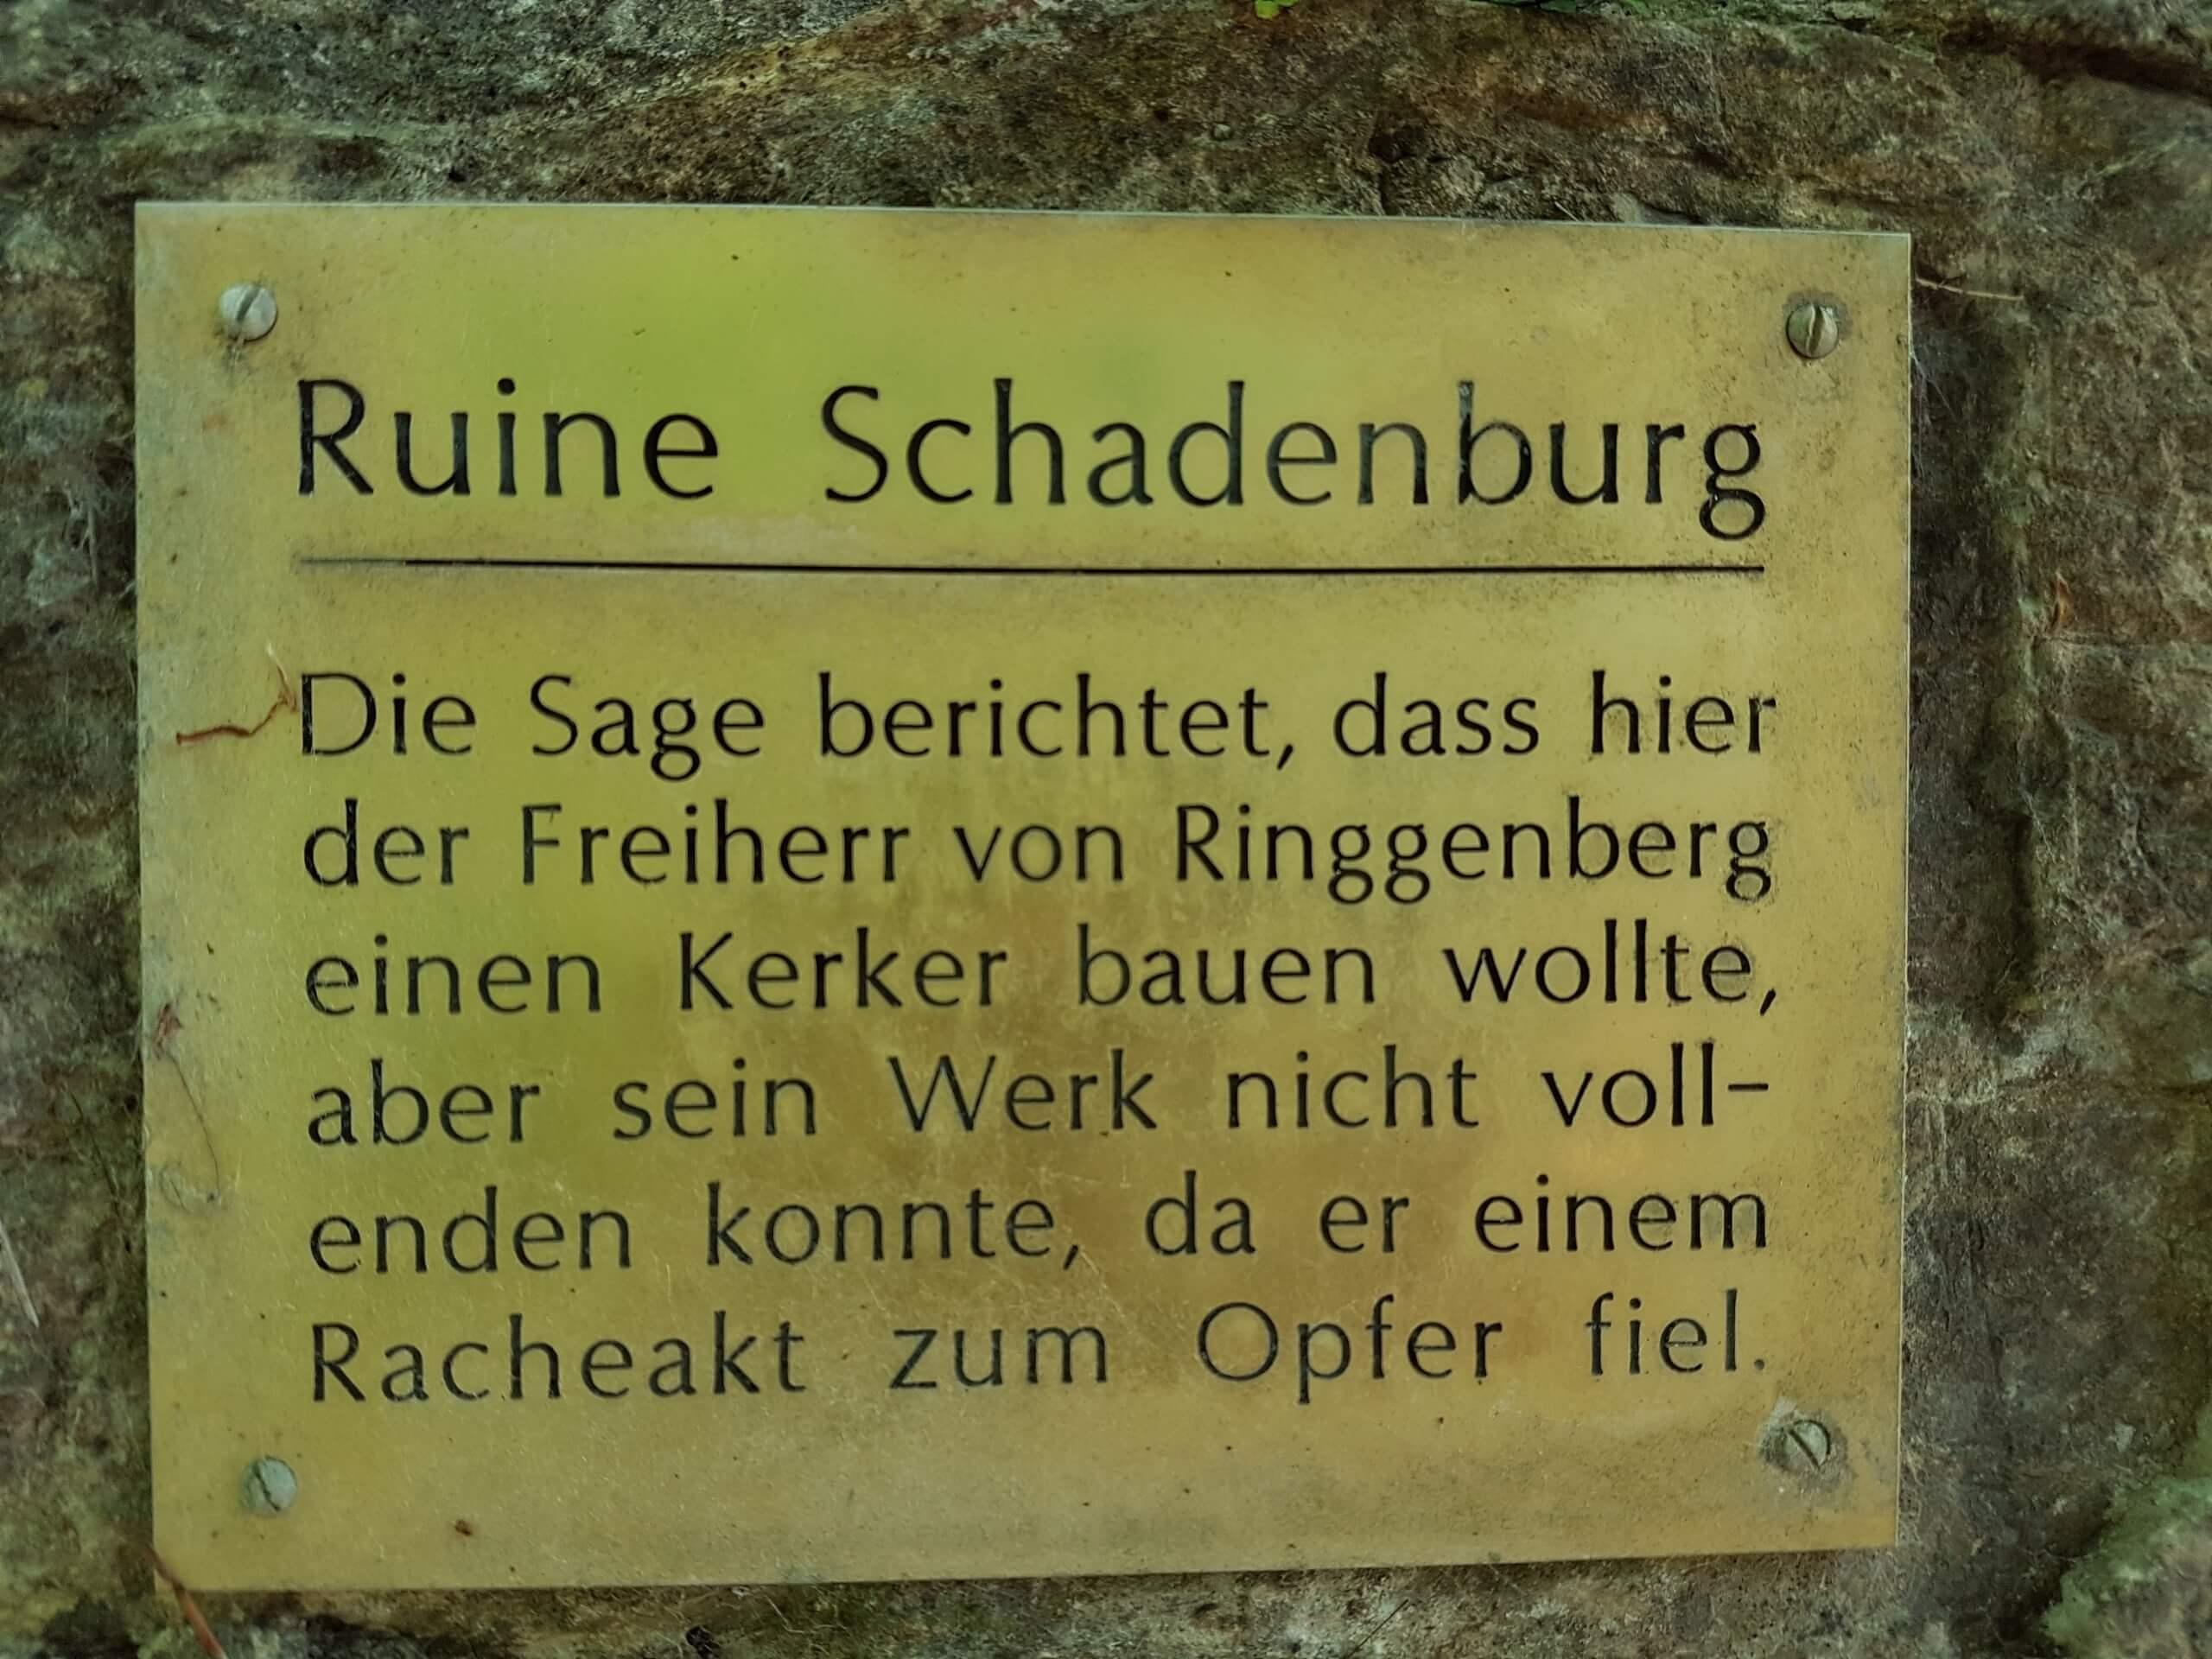 ringgenberg-ruine-schadburg-info-tafel